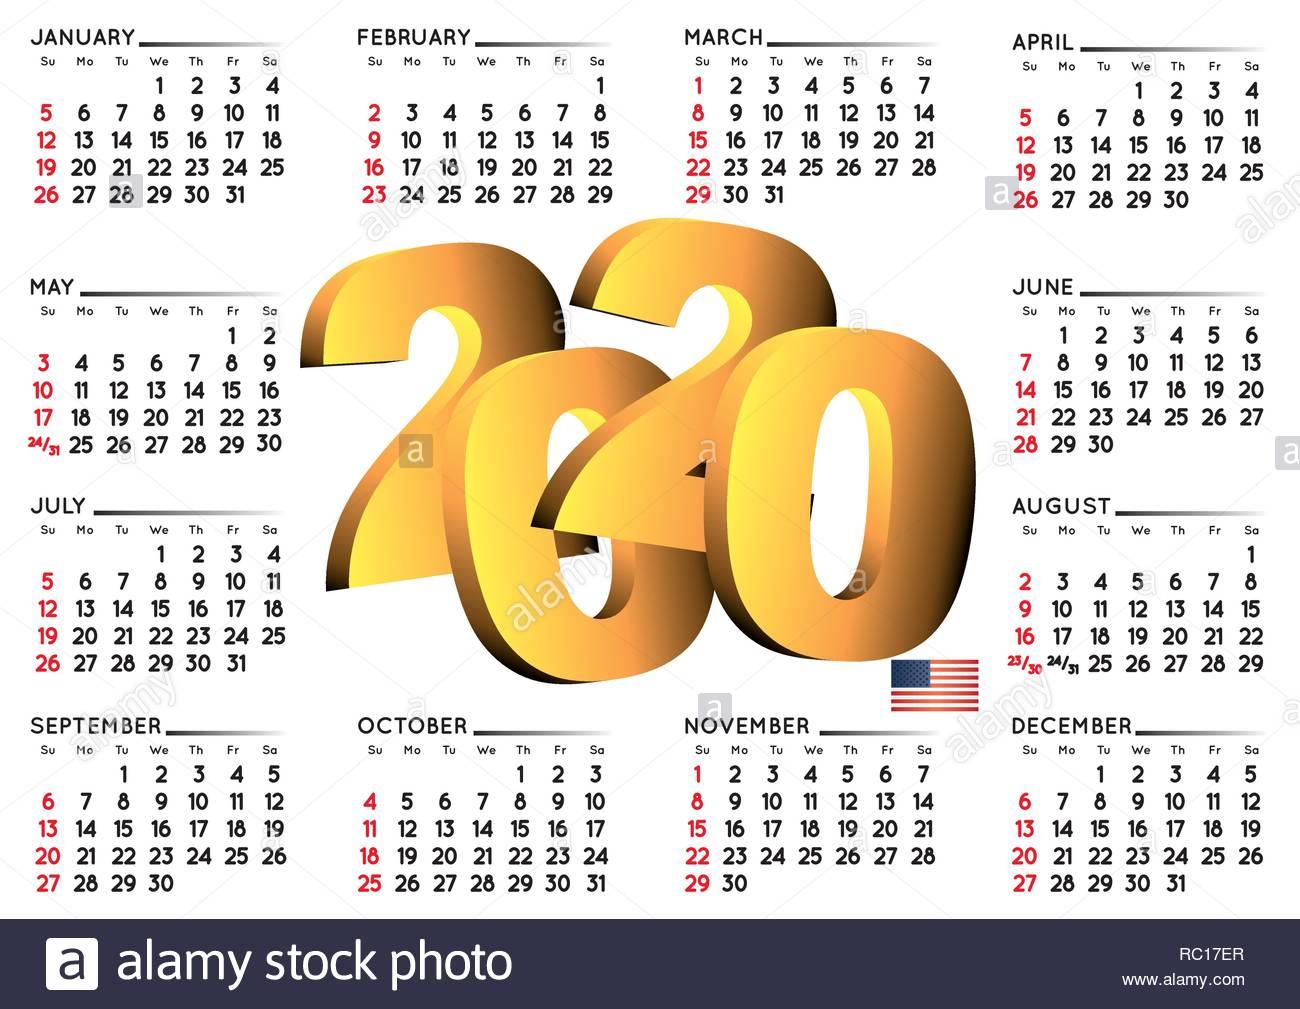 Calendario Febrero 2020 Usa February 2020 Calendar 2020 Cut Out Stock Images & Pictures   Page 2   Alamy